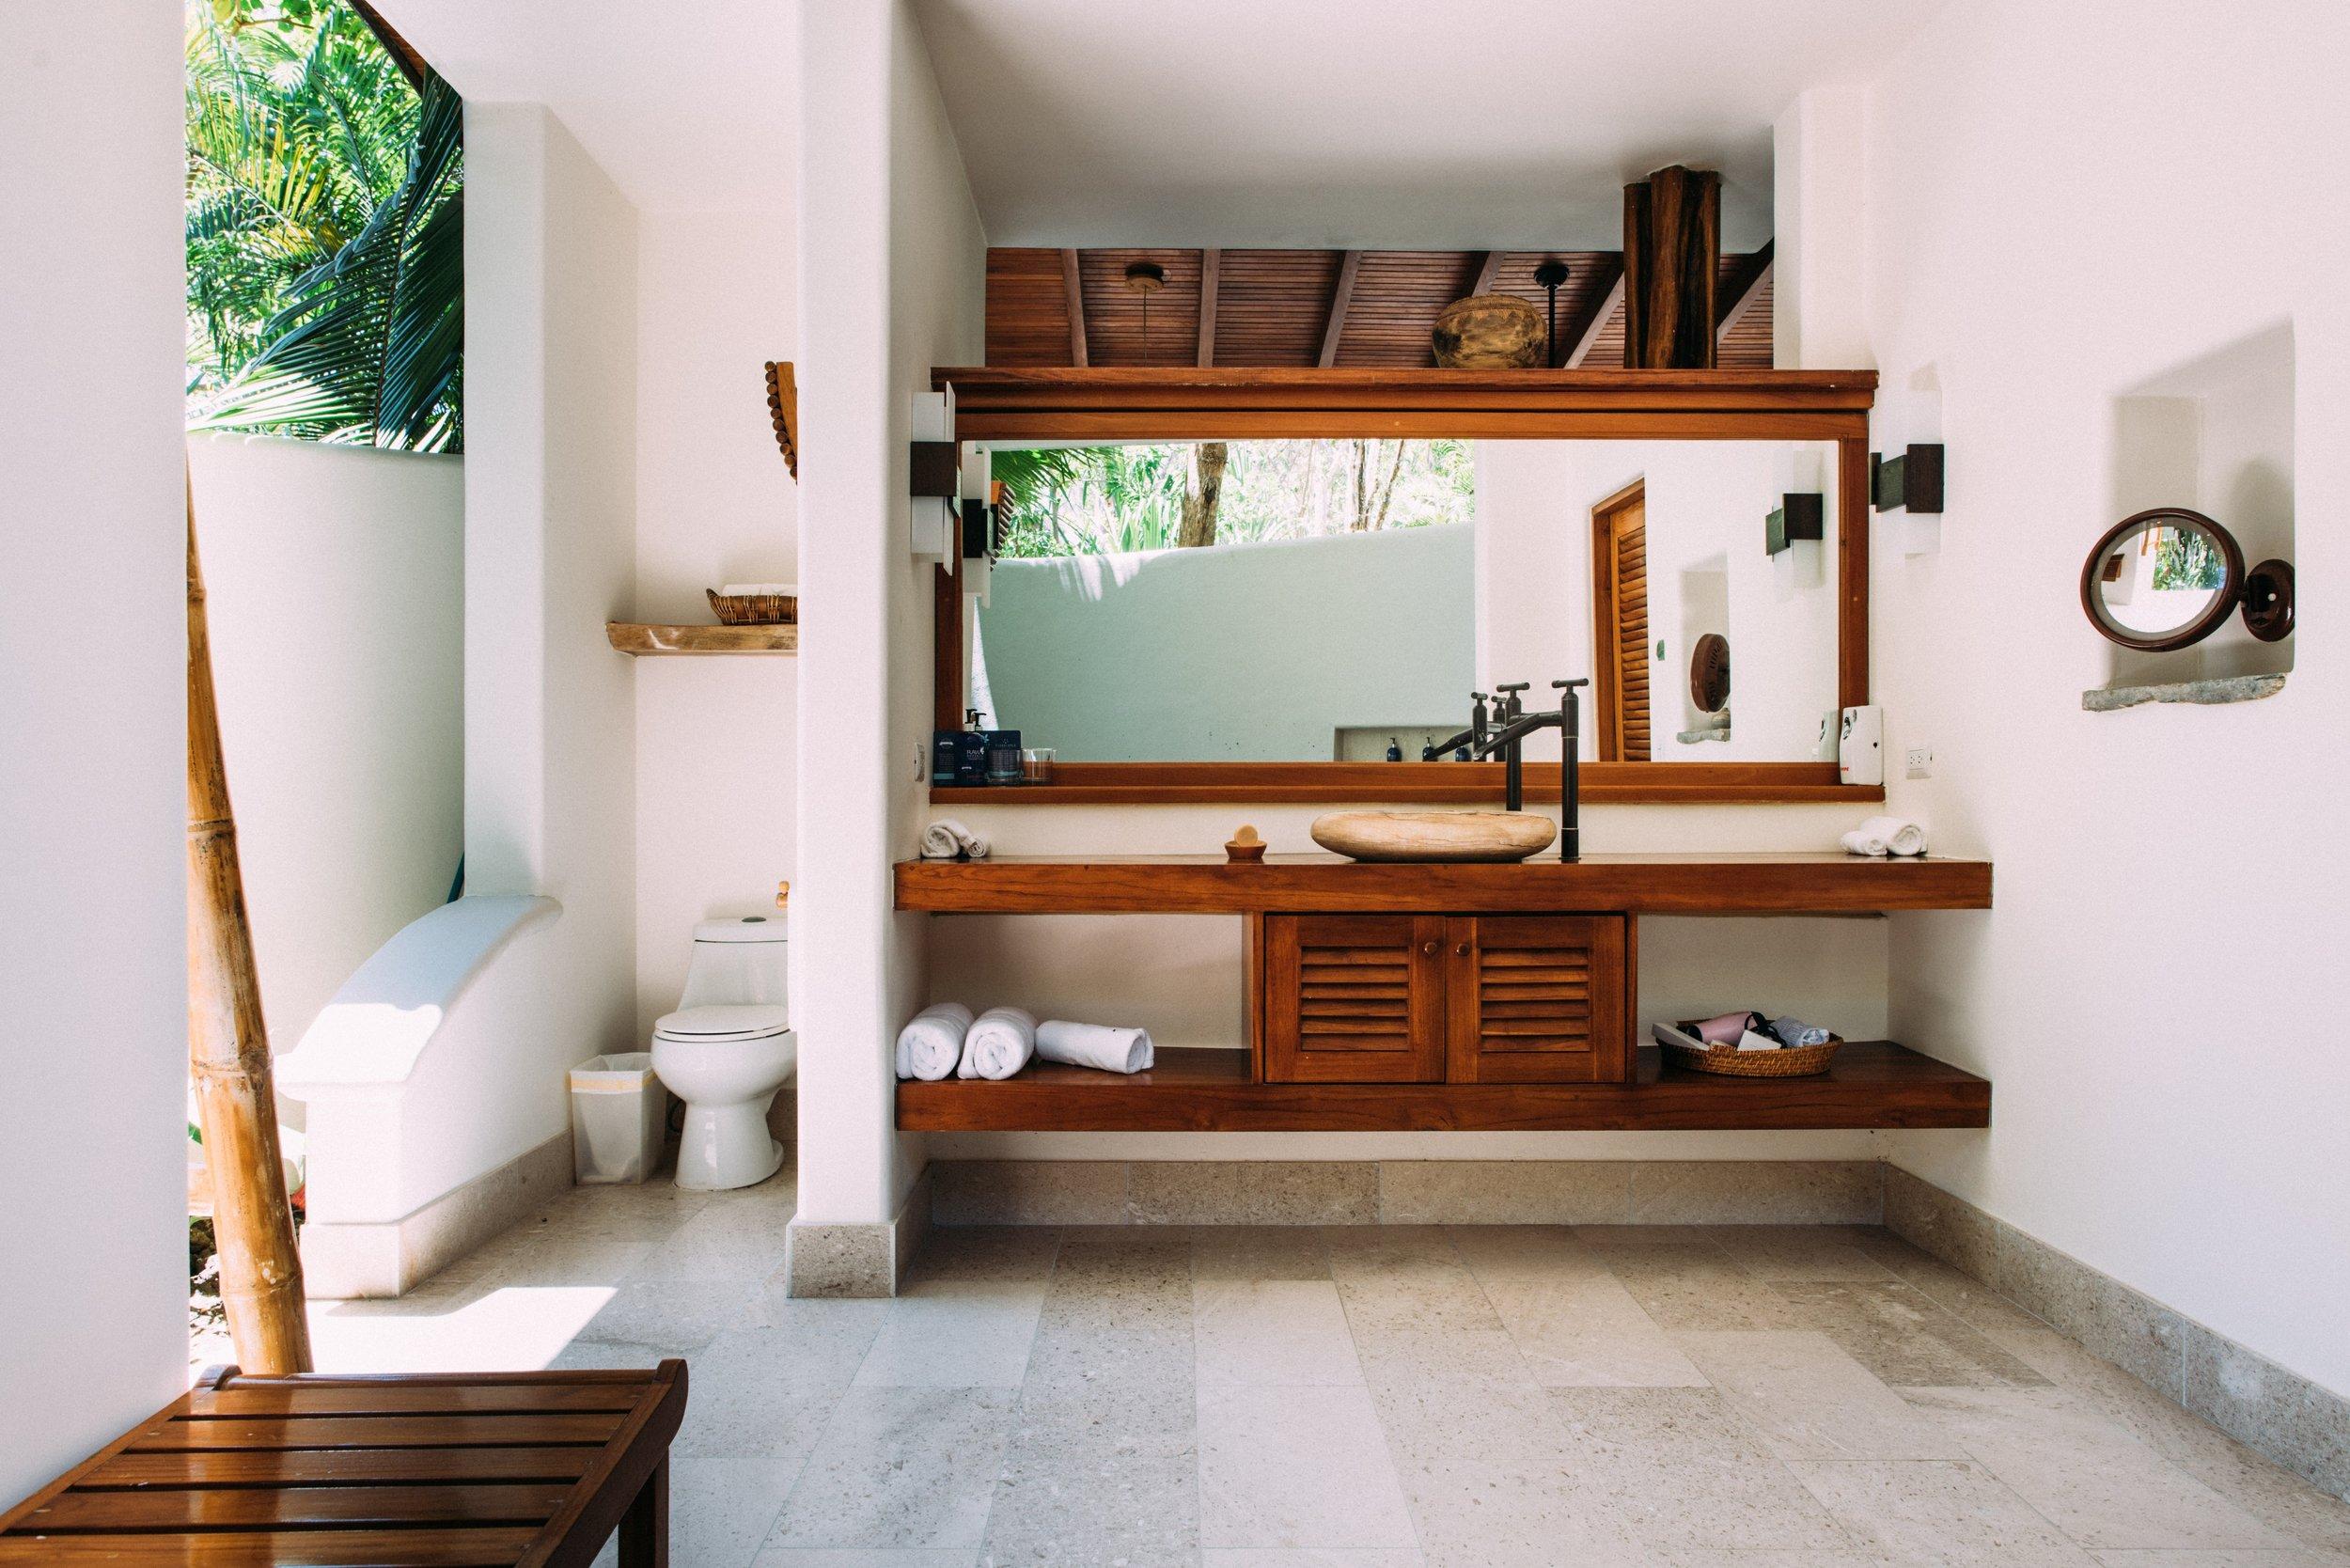 villa-private-bathroom-sink.jpg